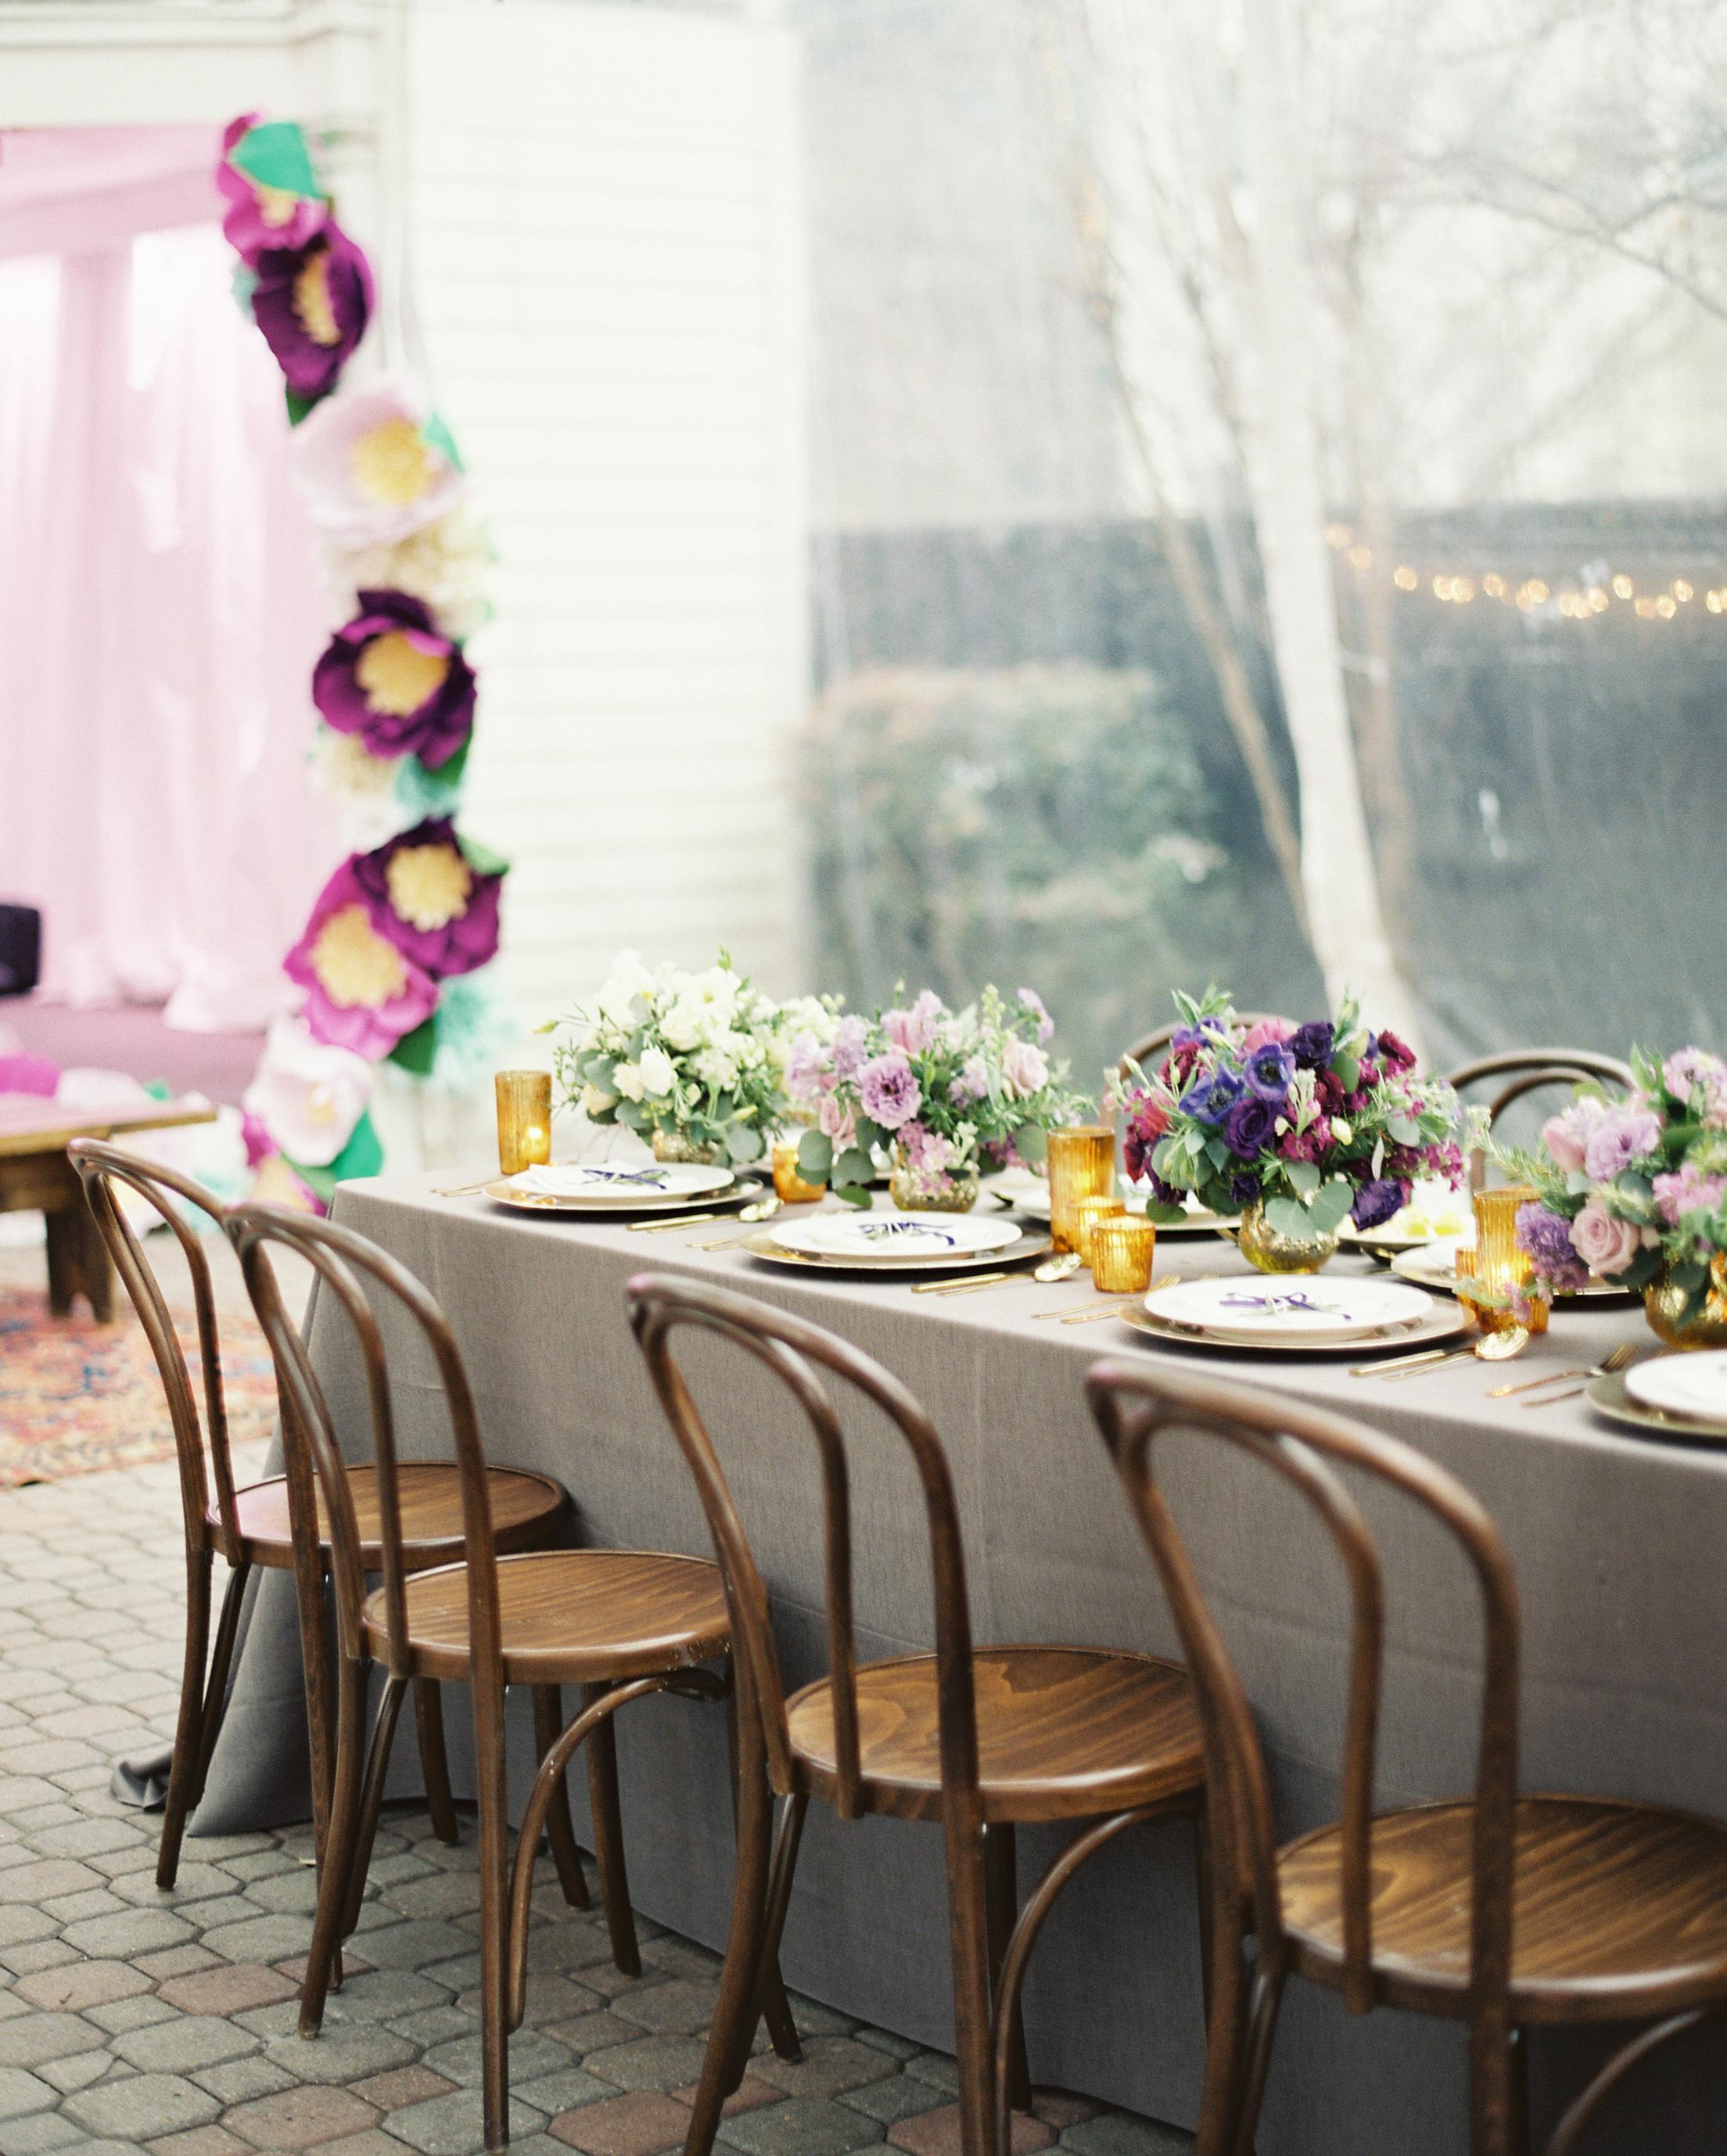 stacey-adam-wedding-table-0073-s112112-0815.jpg